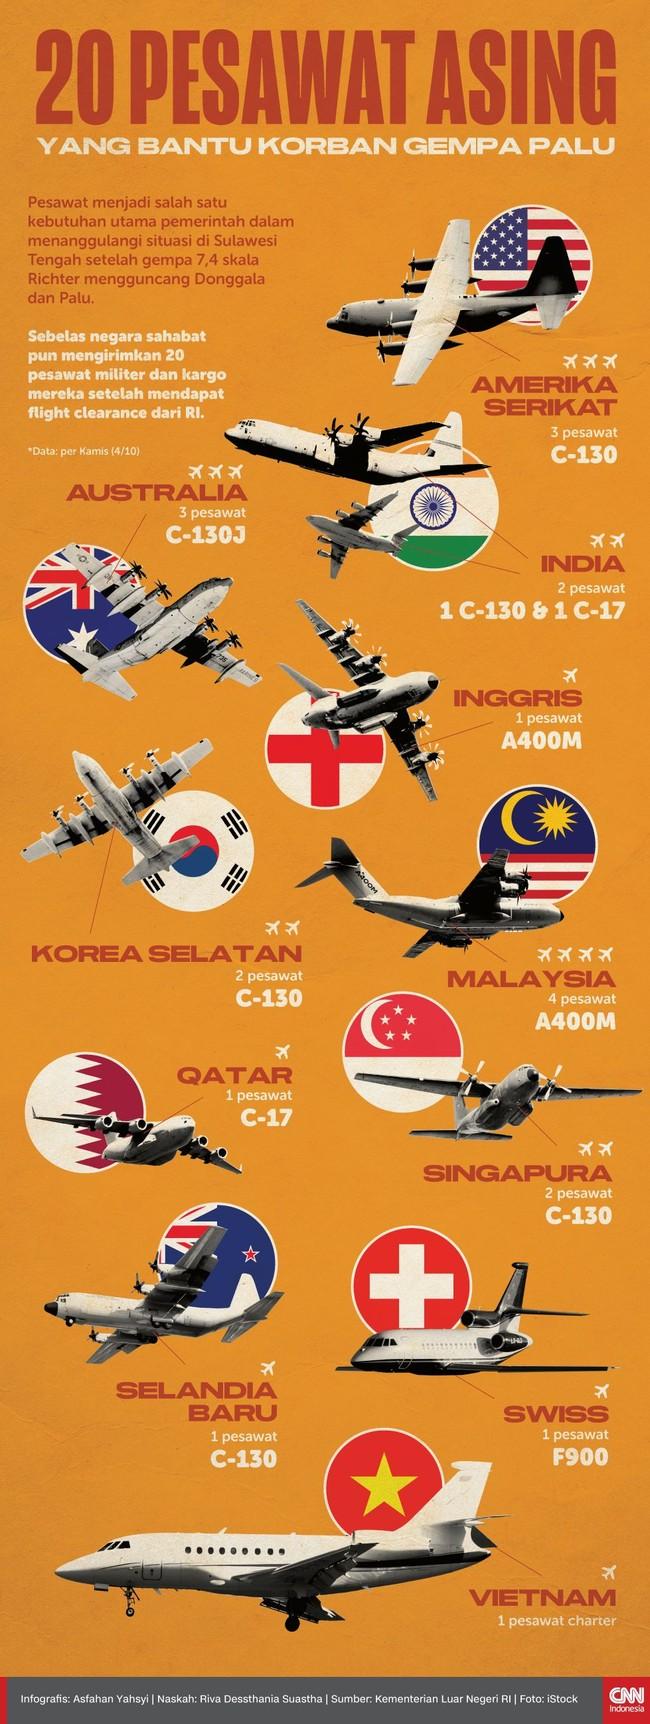 INFOGRAFIS: 20 Pesawat Asing yang Bantu Korban Gempa Palu